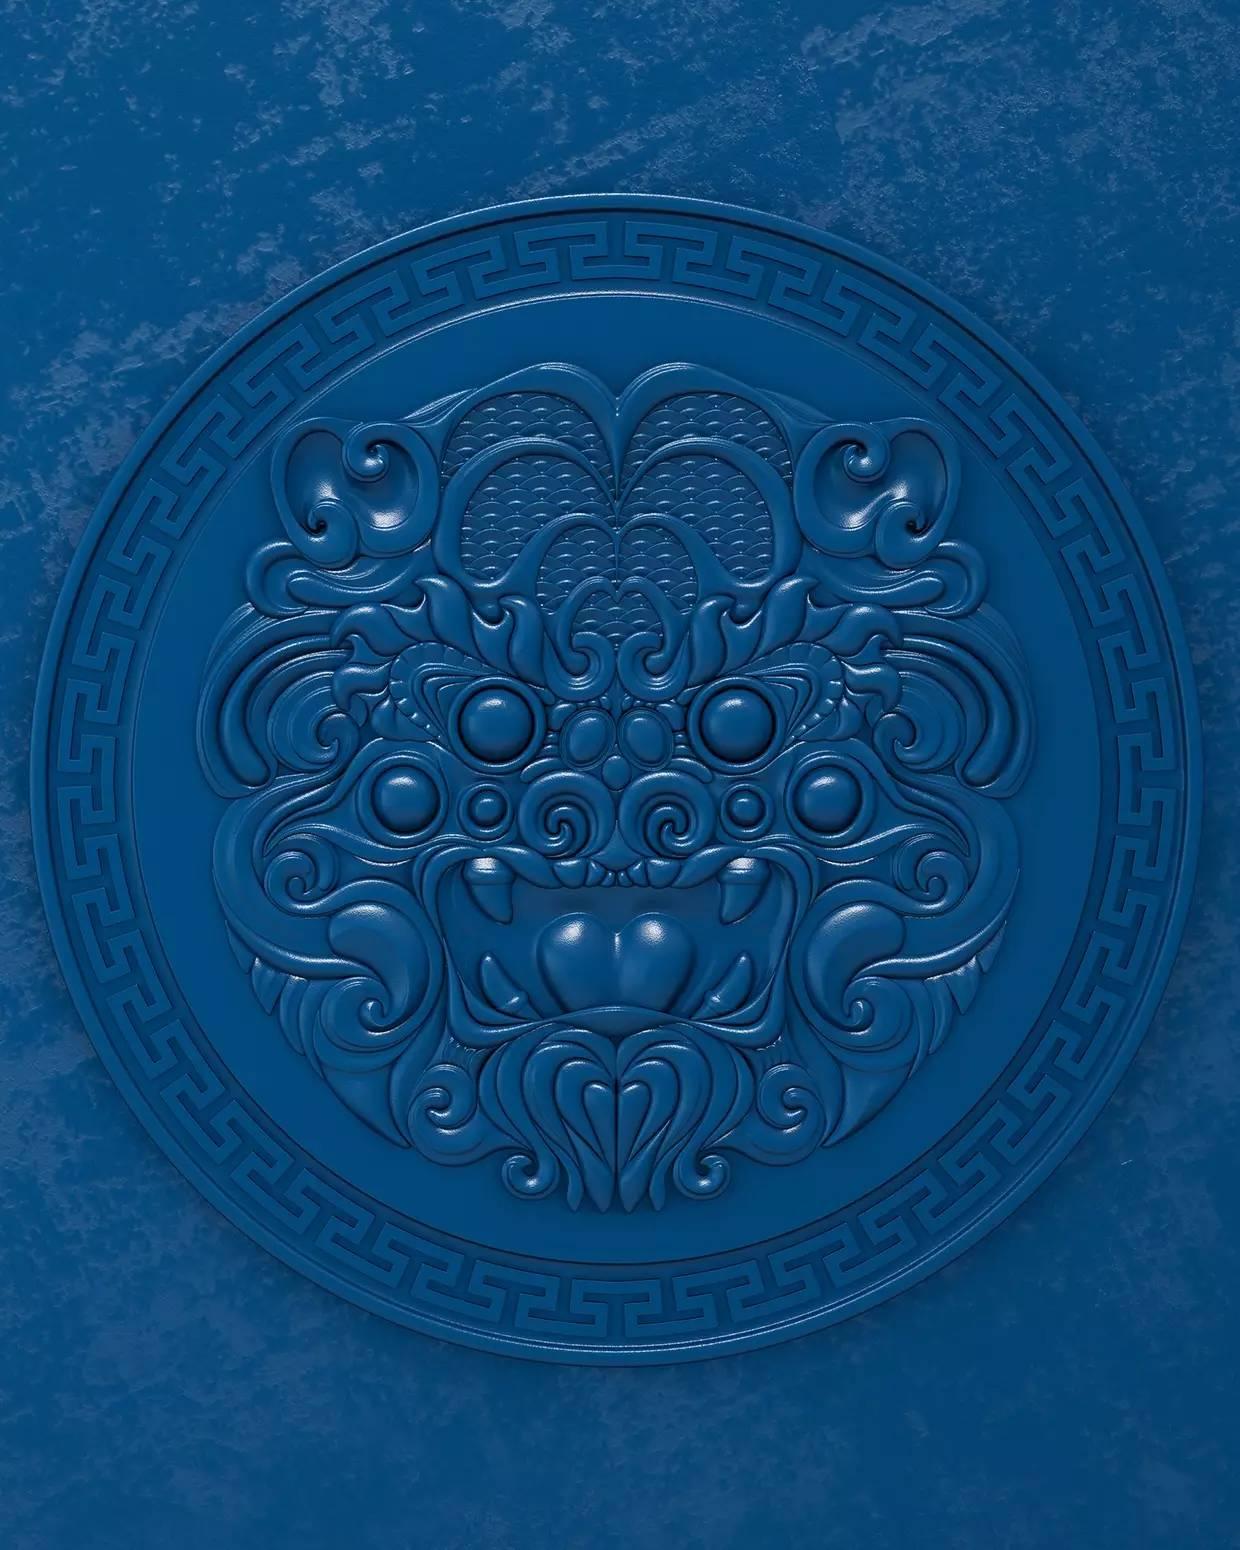 室内设计 蒙族传统装饰(Mongolian Traditional Ornament) 第15张